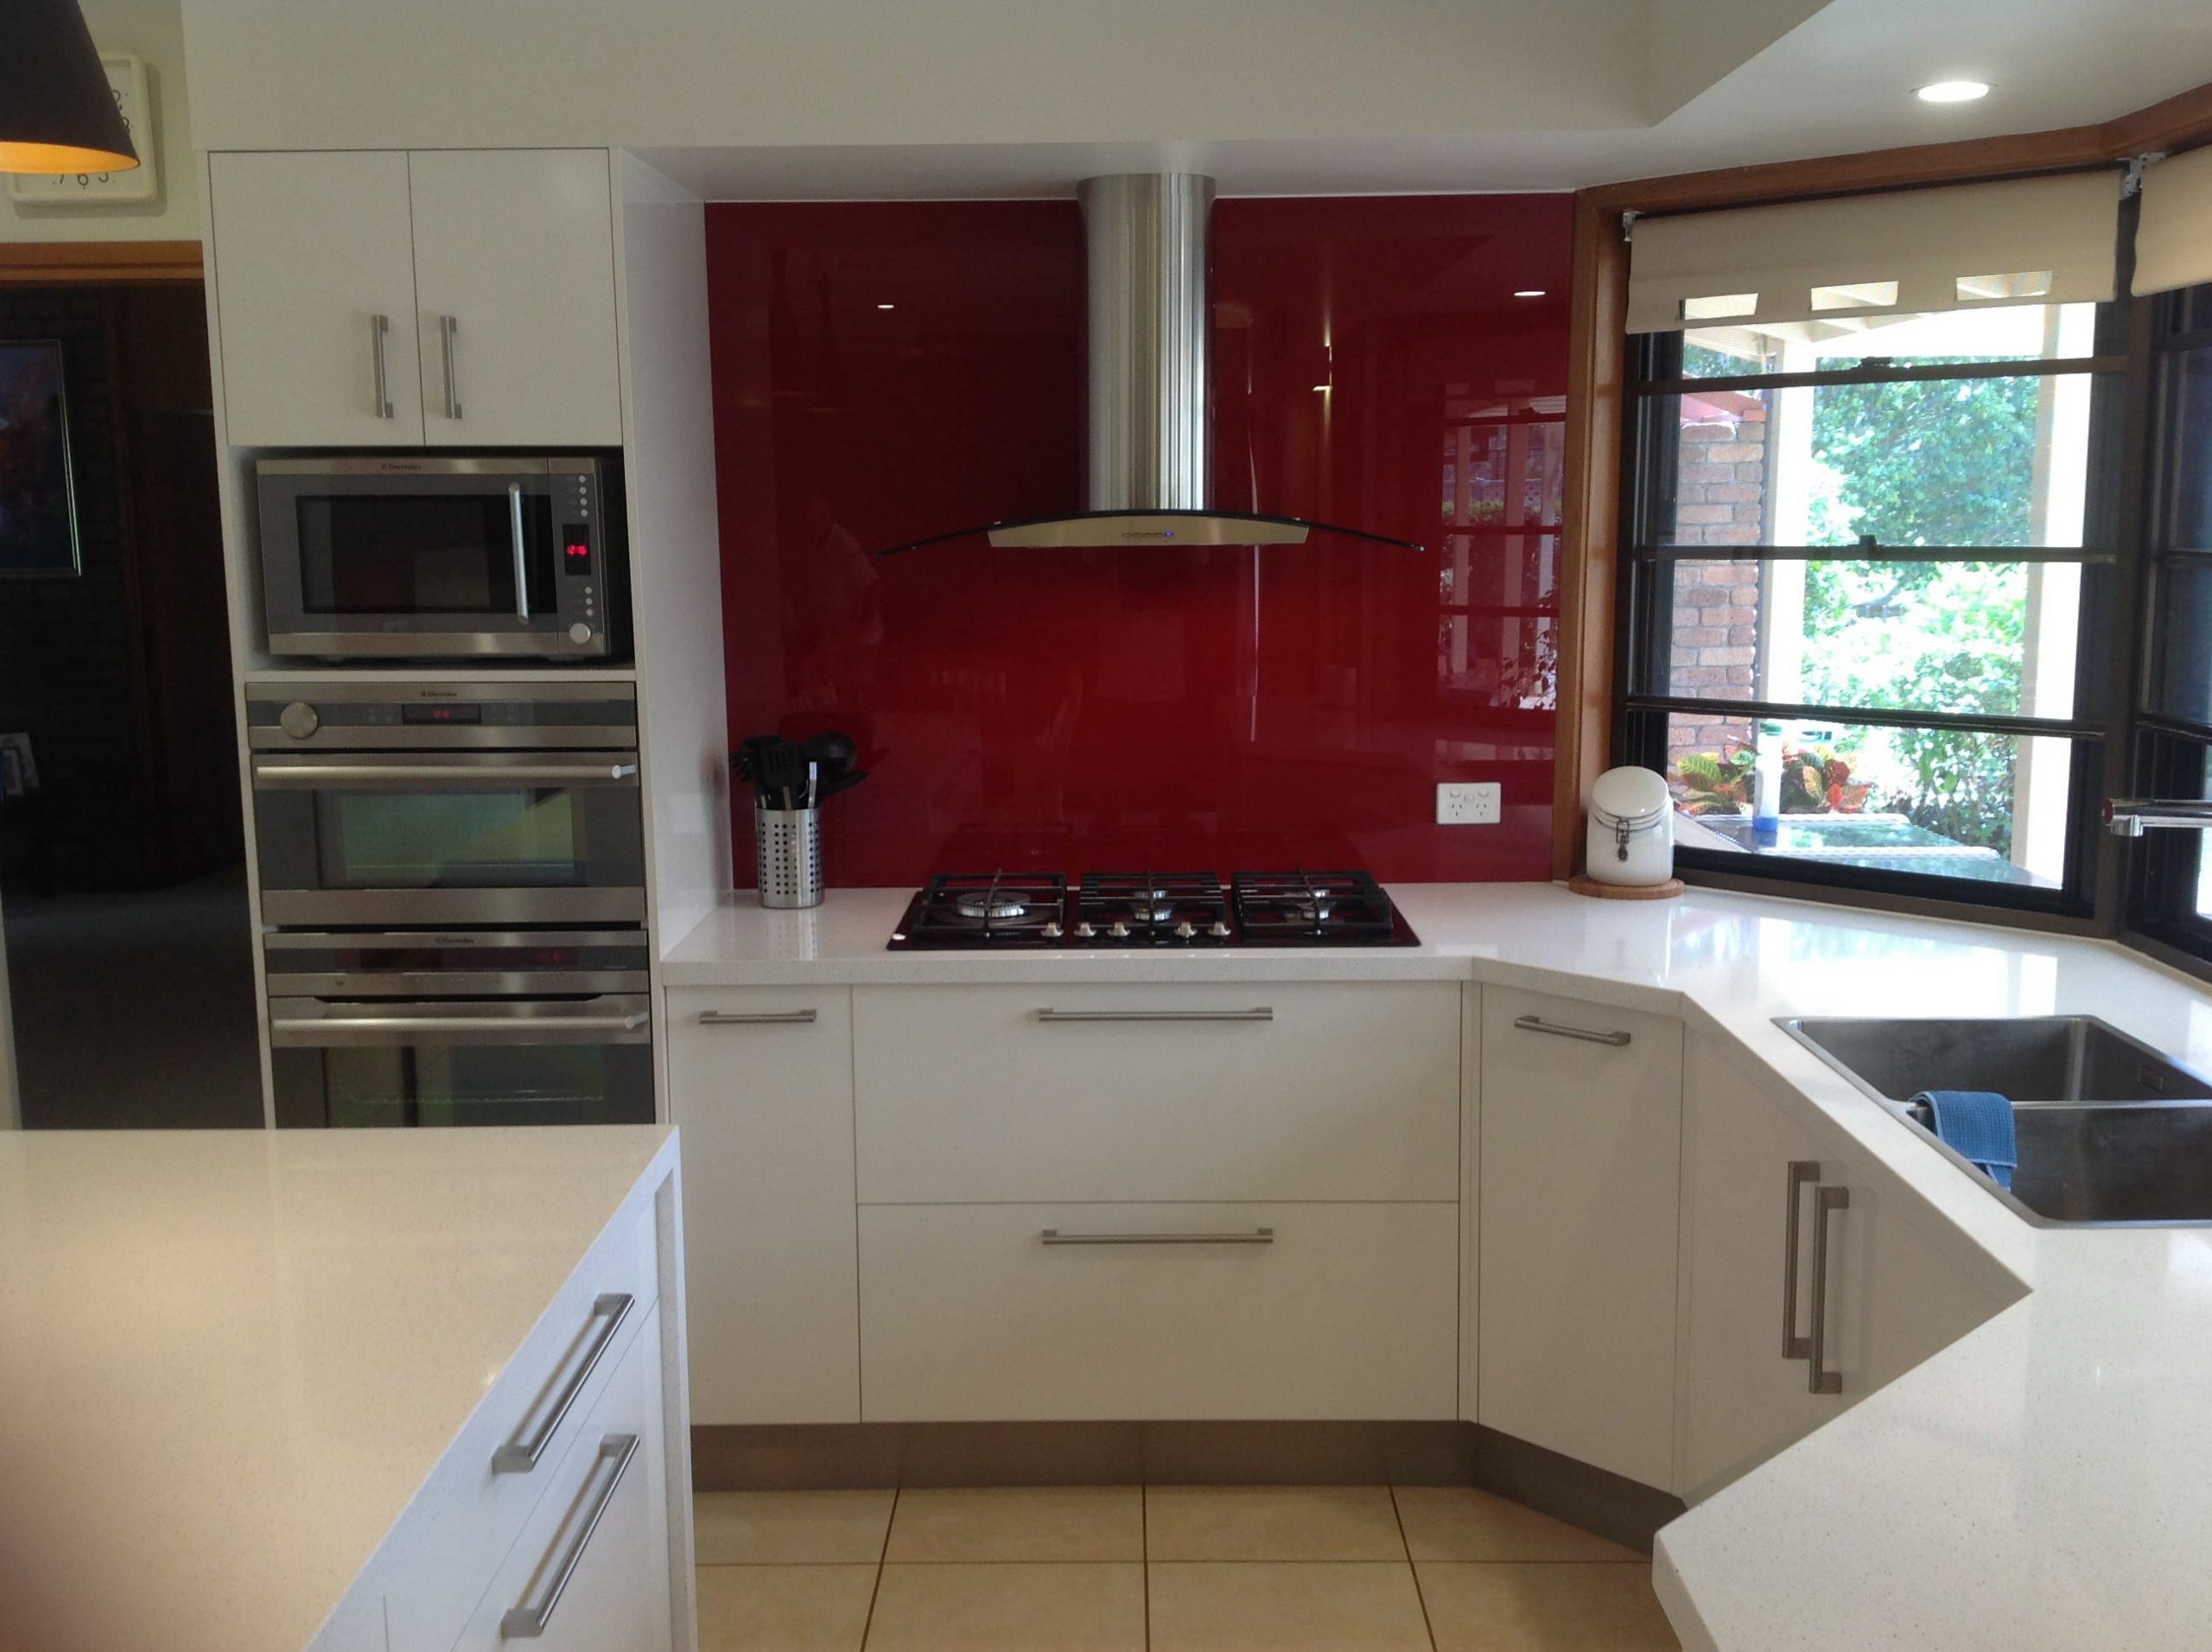 Kitchen Renovations - Gold Coast - Renovation at Helensvale